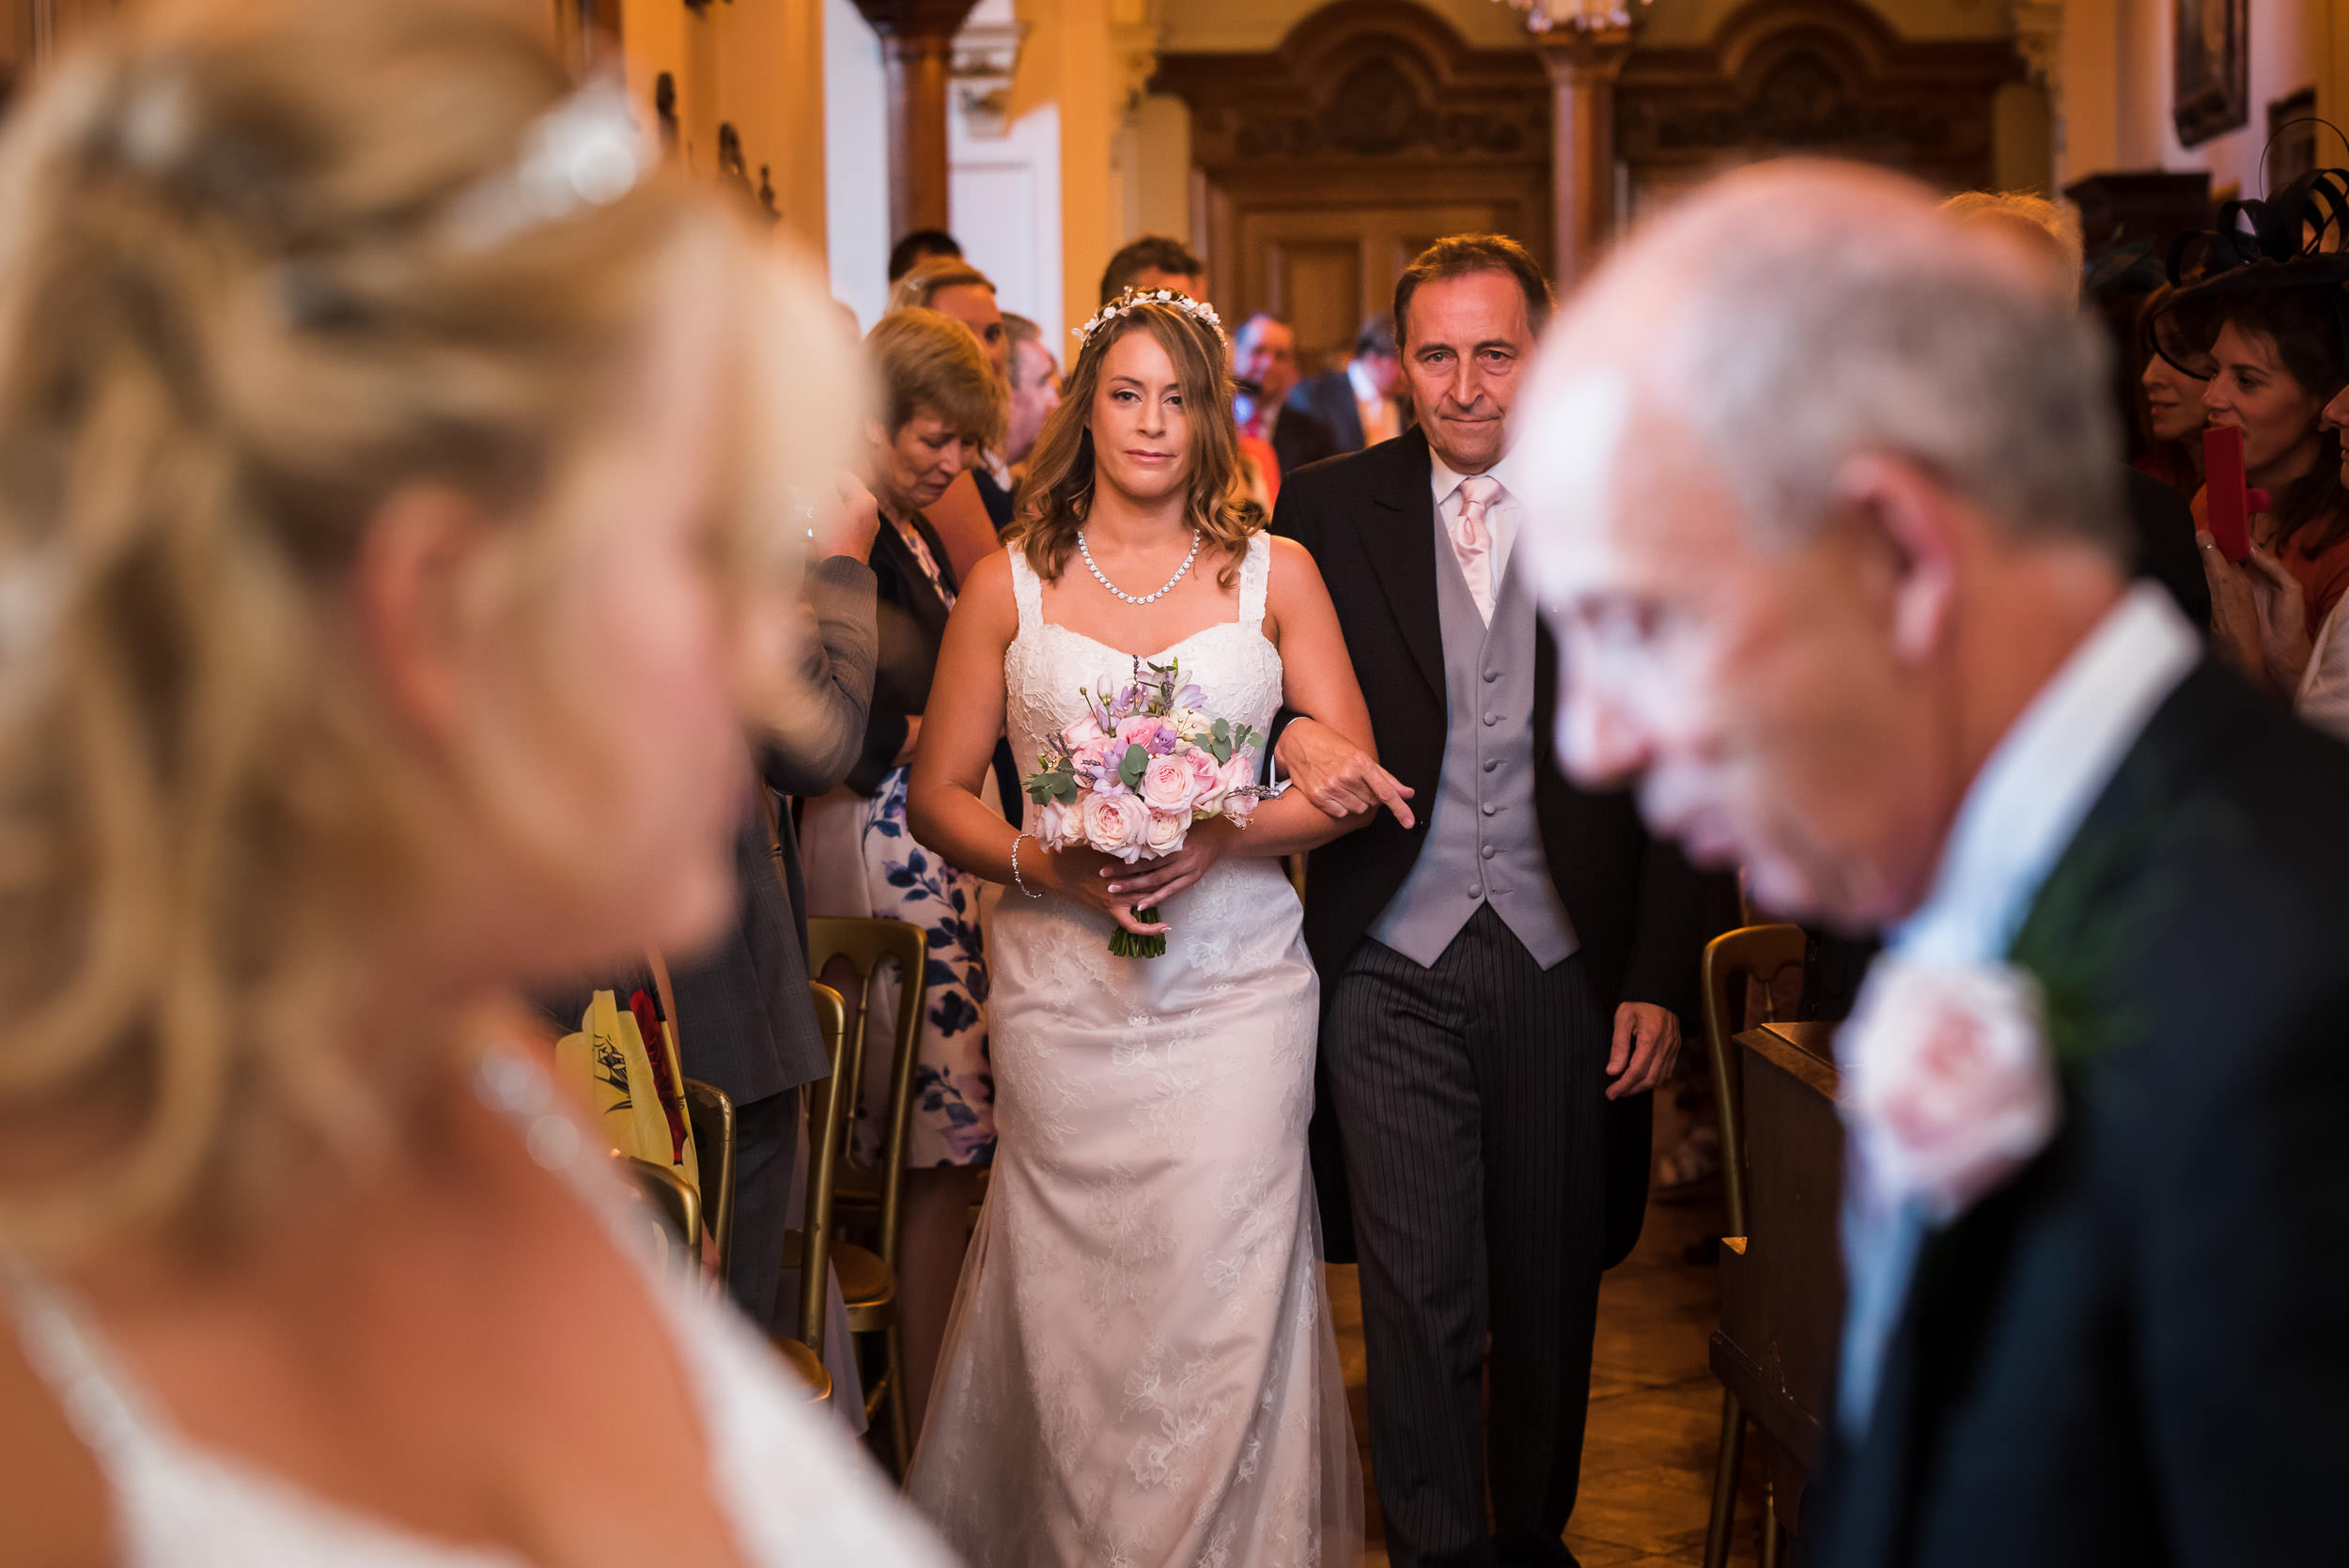 NC-20170909-2017-09-09_livvy-and-alice-wedding-0777.jpg